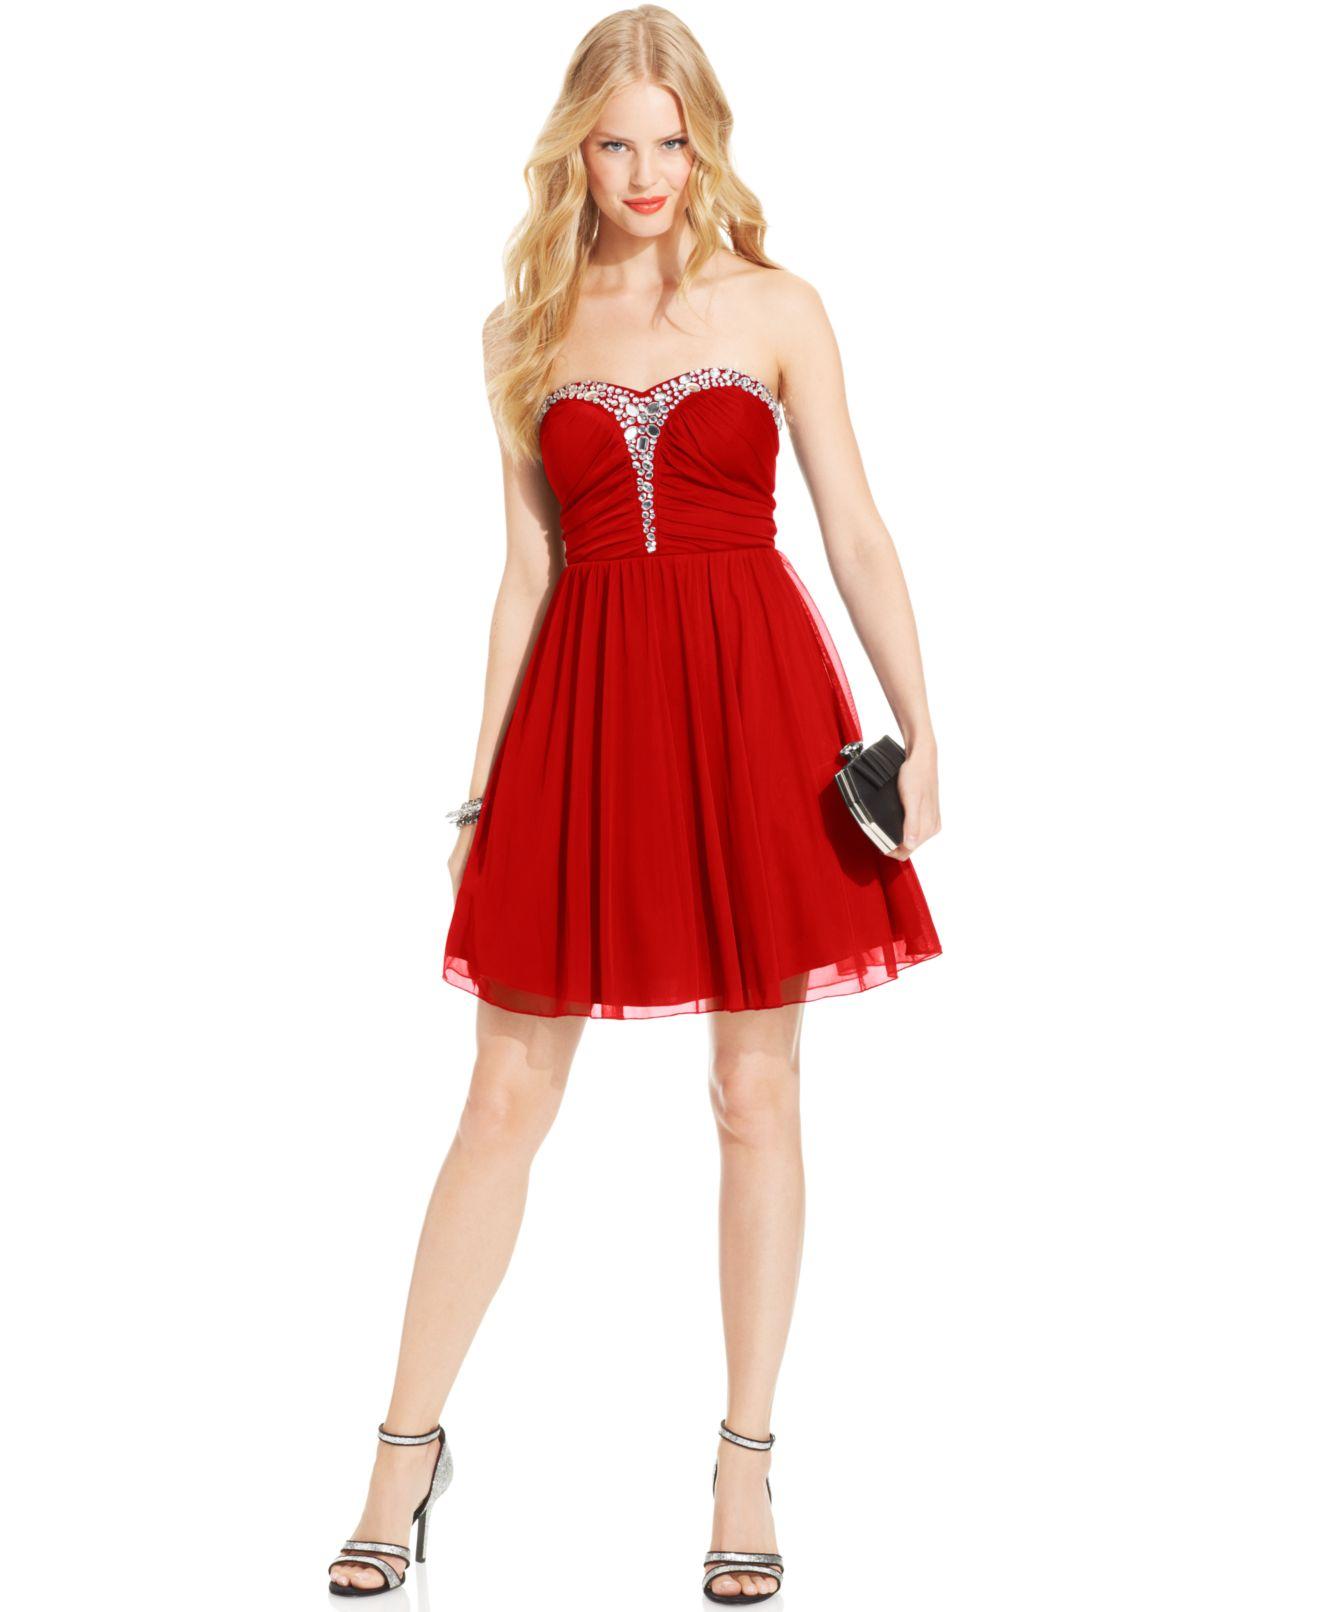 Prom Dresses In Arizona